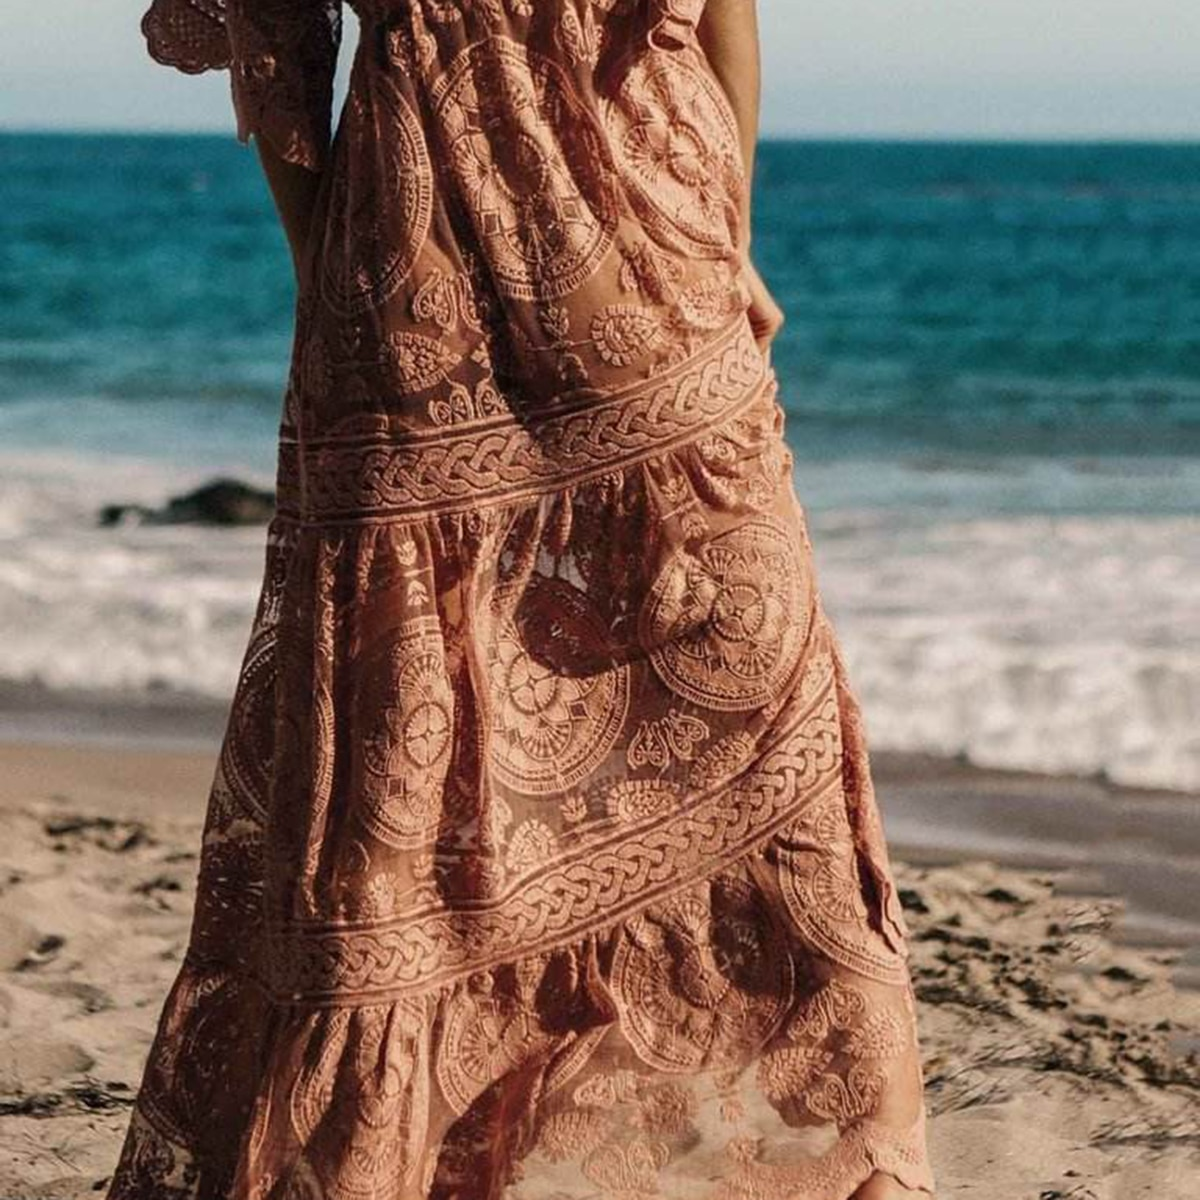 Mandala Black Orchid Maxi Dress Women 19 Summer Half Sleeve Deep V neck Sexy Dress Boho Lace Floral Embroidery Long Dress 3